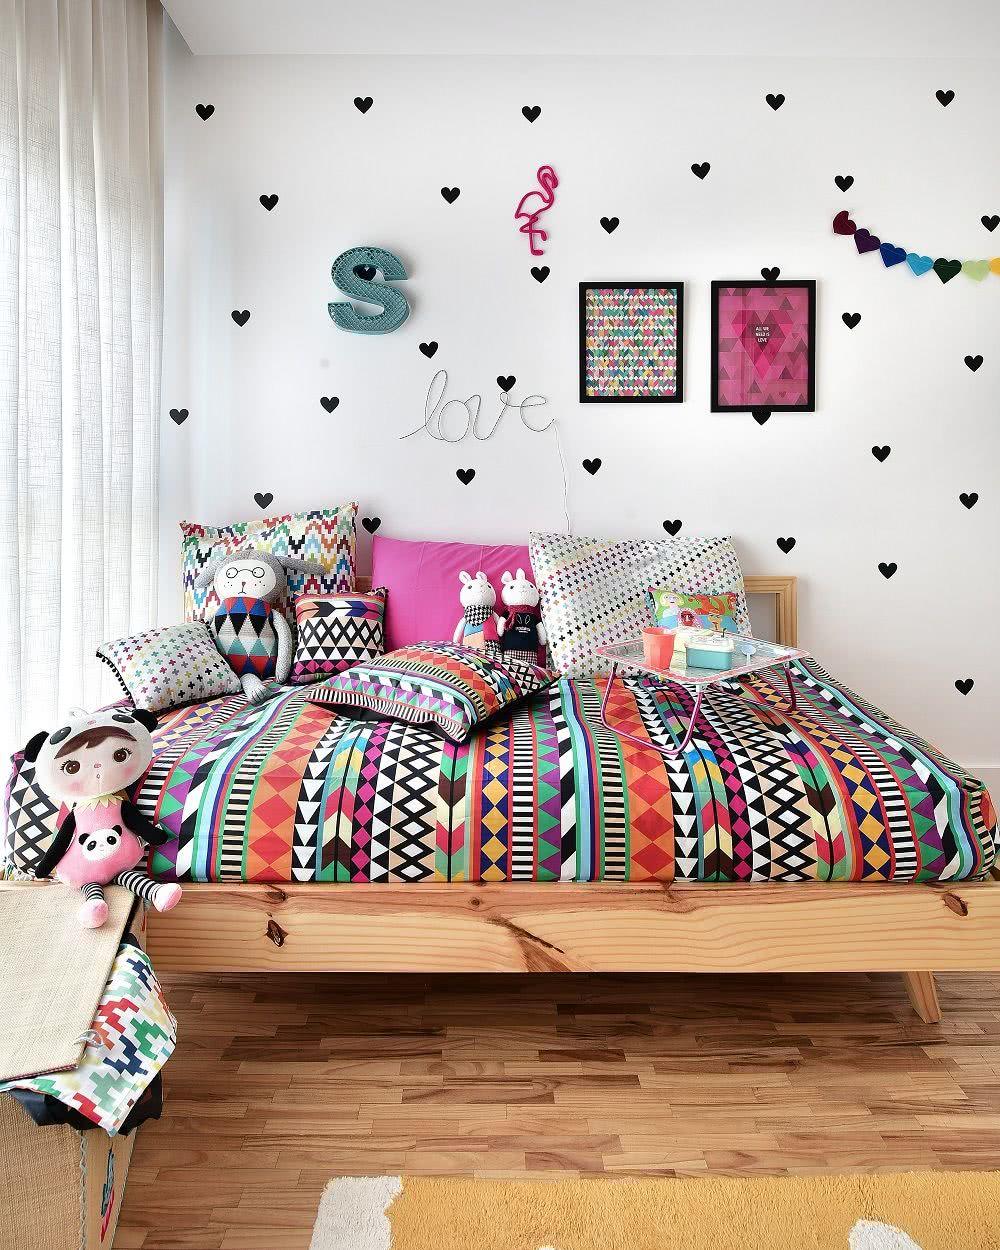 dica de decoracao quarto menina adolescente